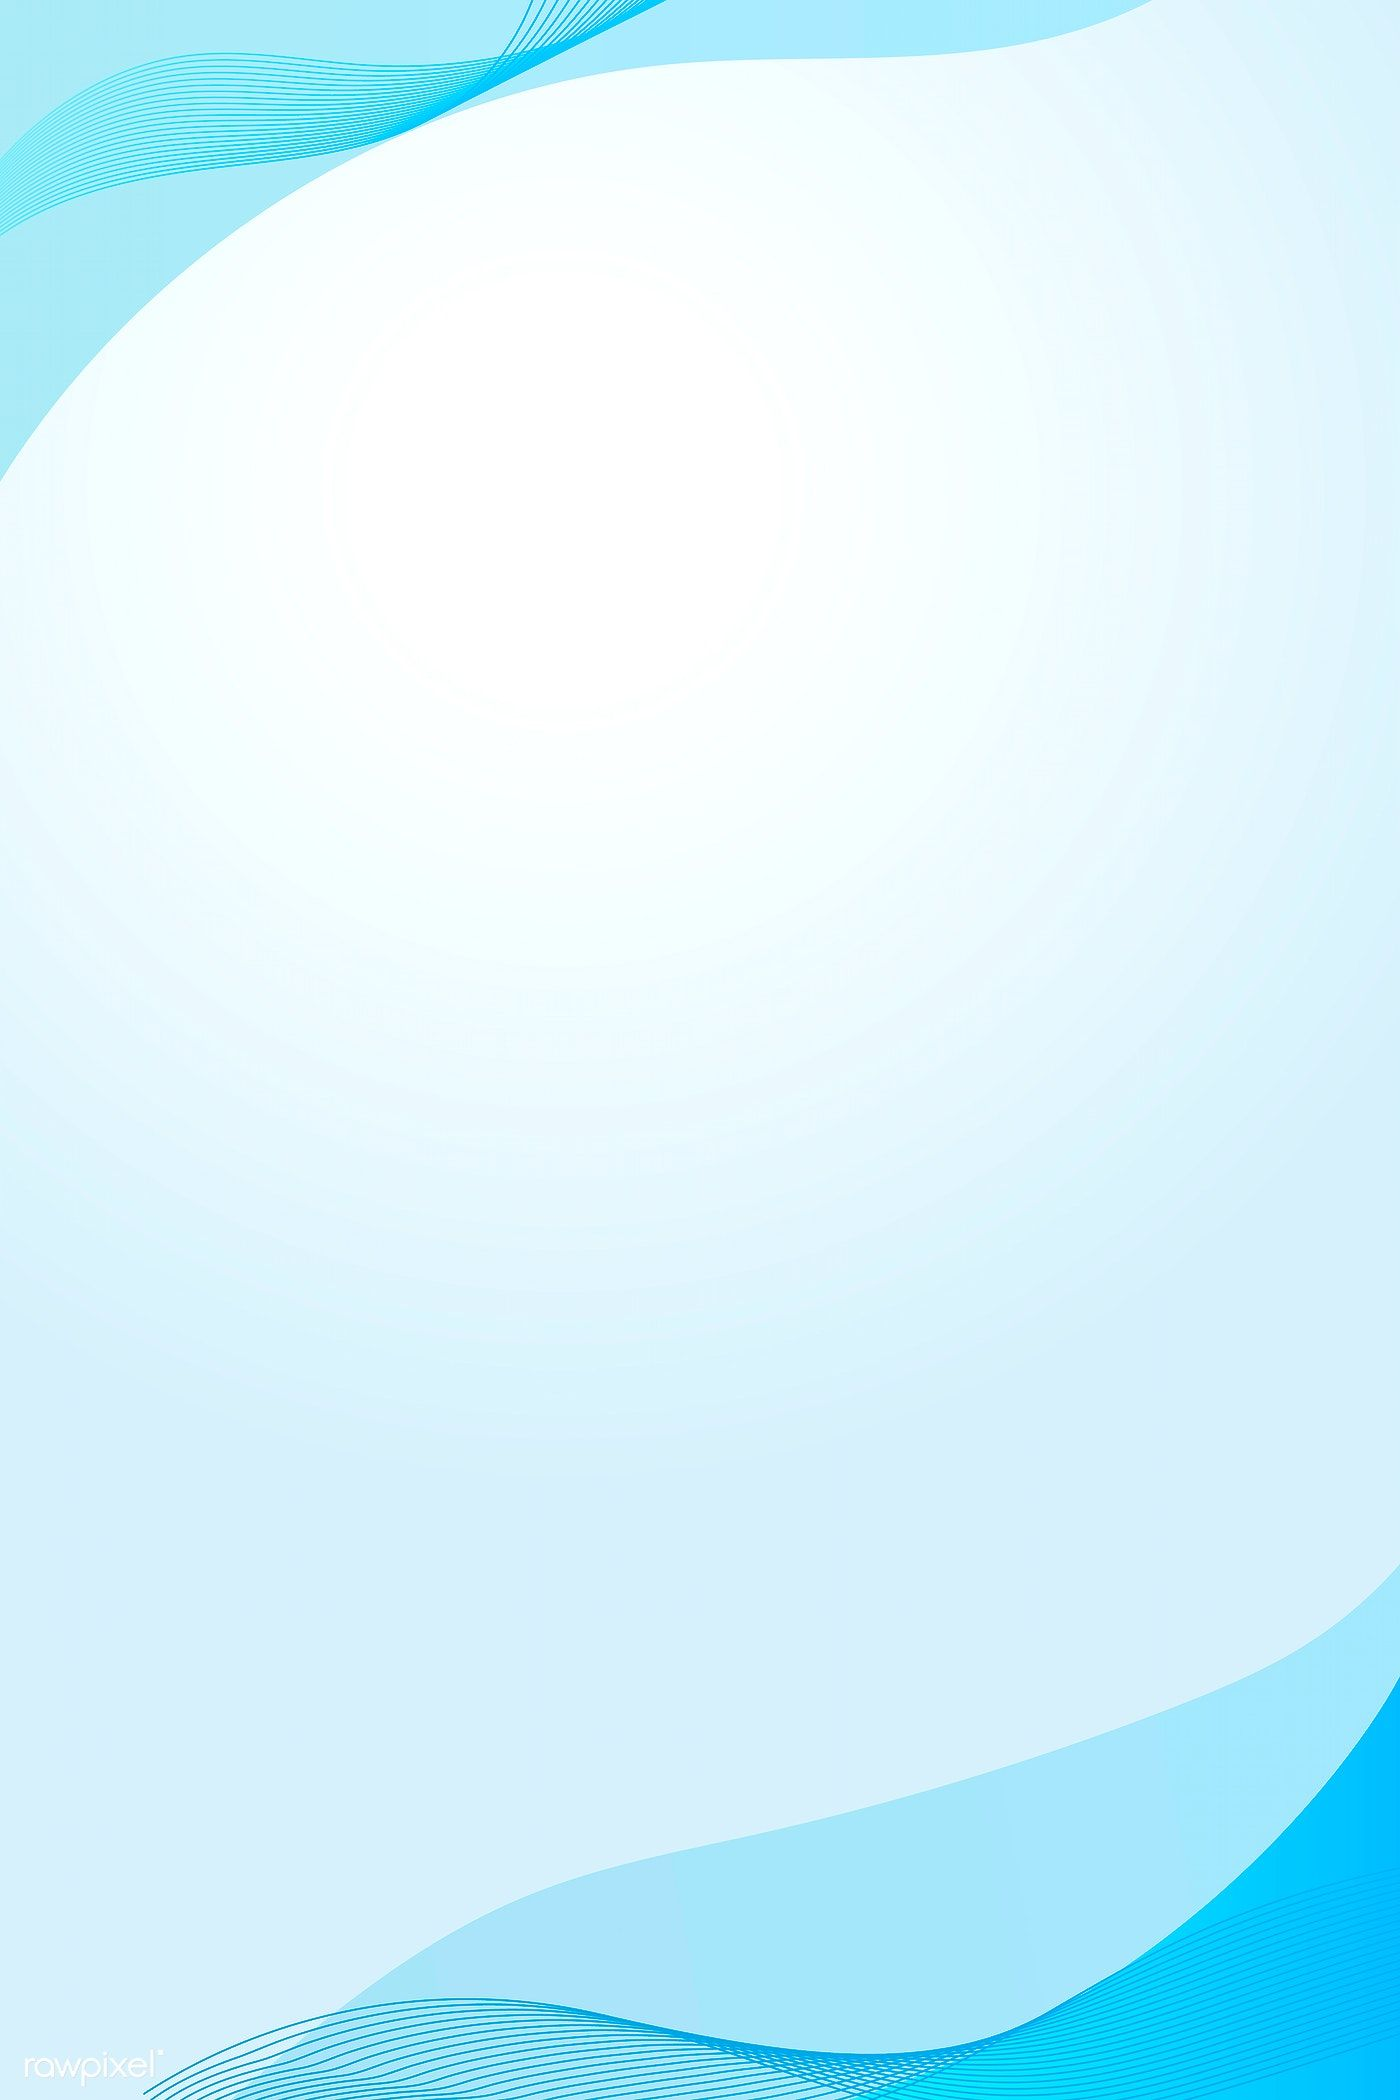 Cerulean Blue Curve Frame Template Vector Free Image By Rawpixel Com Mind Desain Banner Desain Pamflet Spanduk